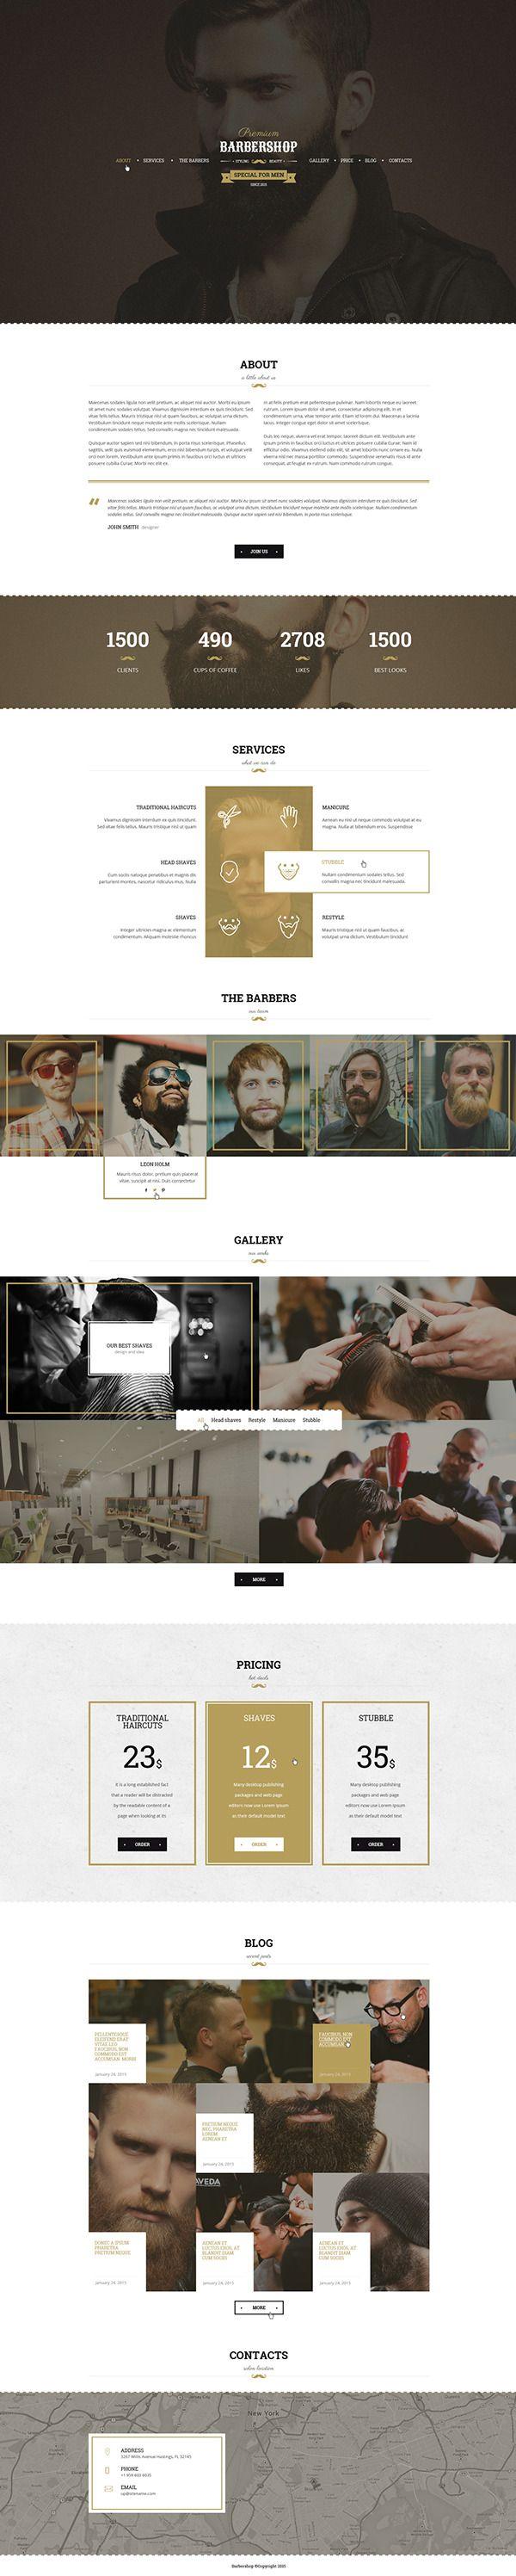 https://www.behance.net/gallery/24583189/Barbershop-One-Page-Barbers-Theme